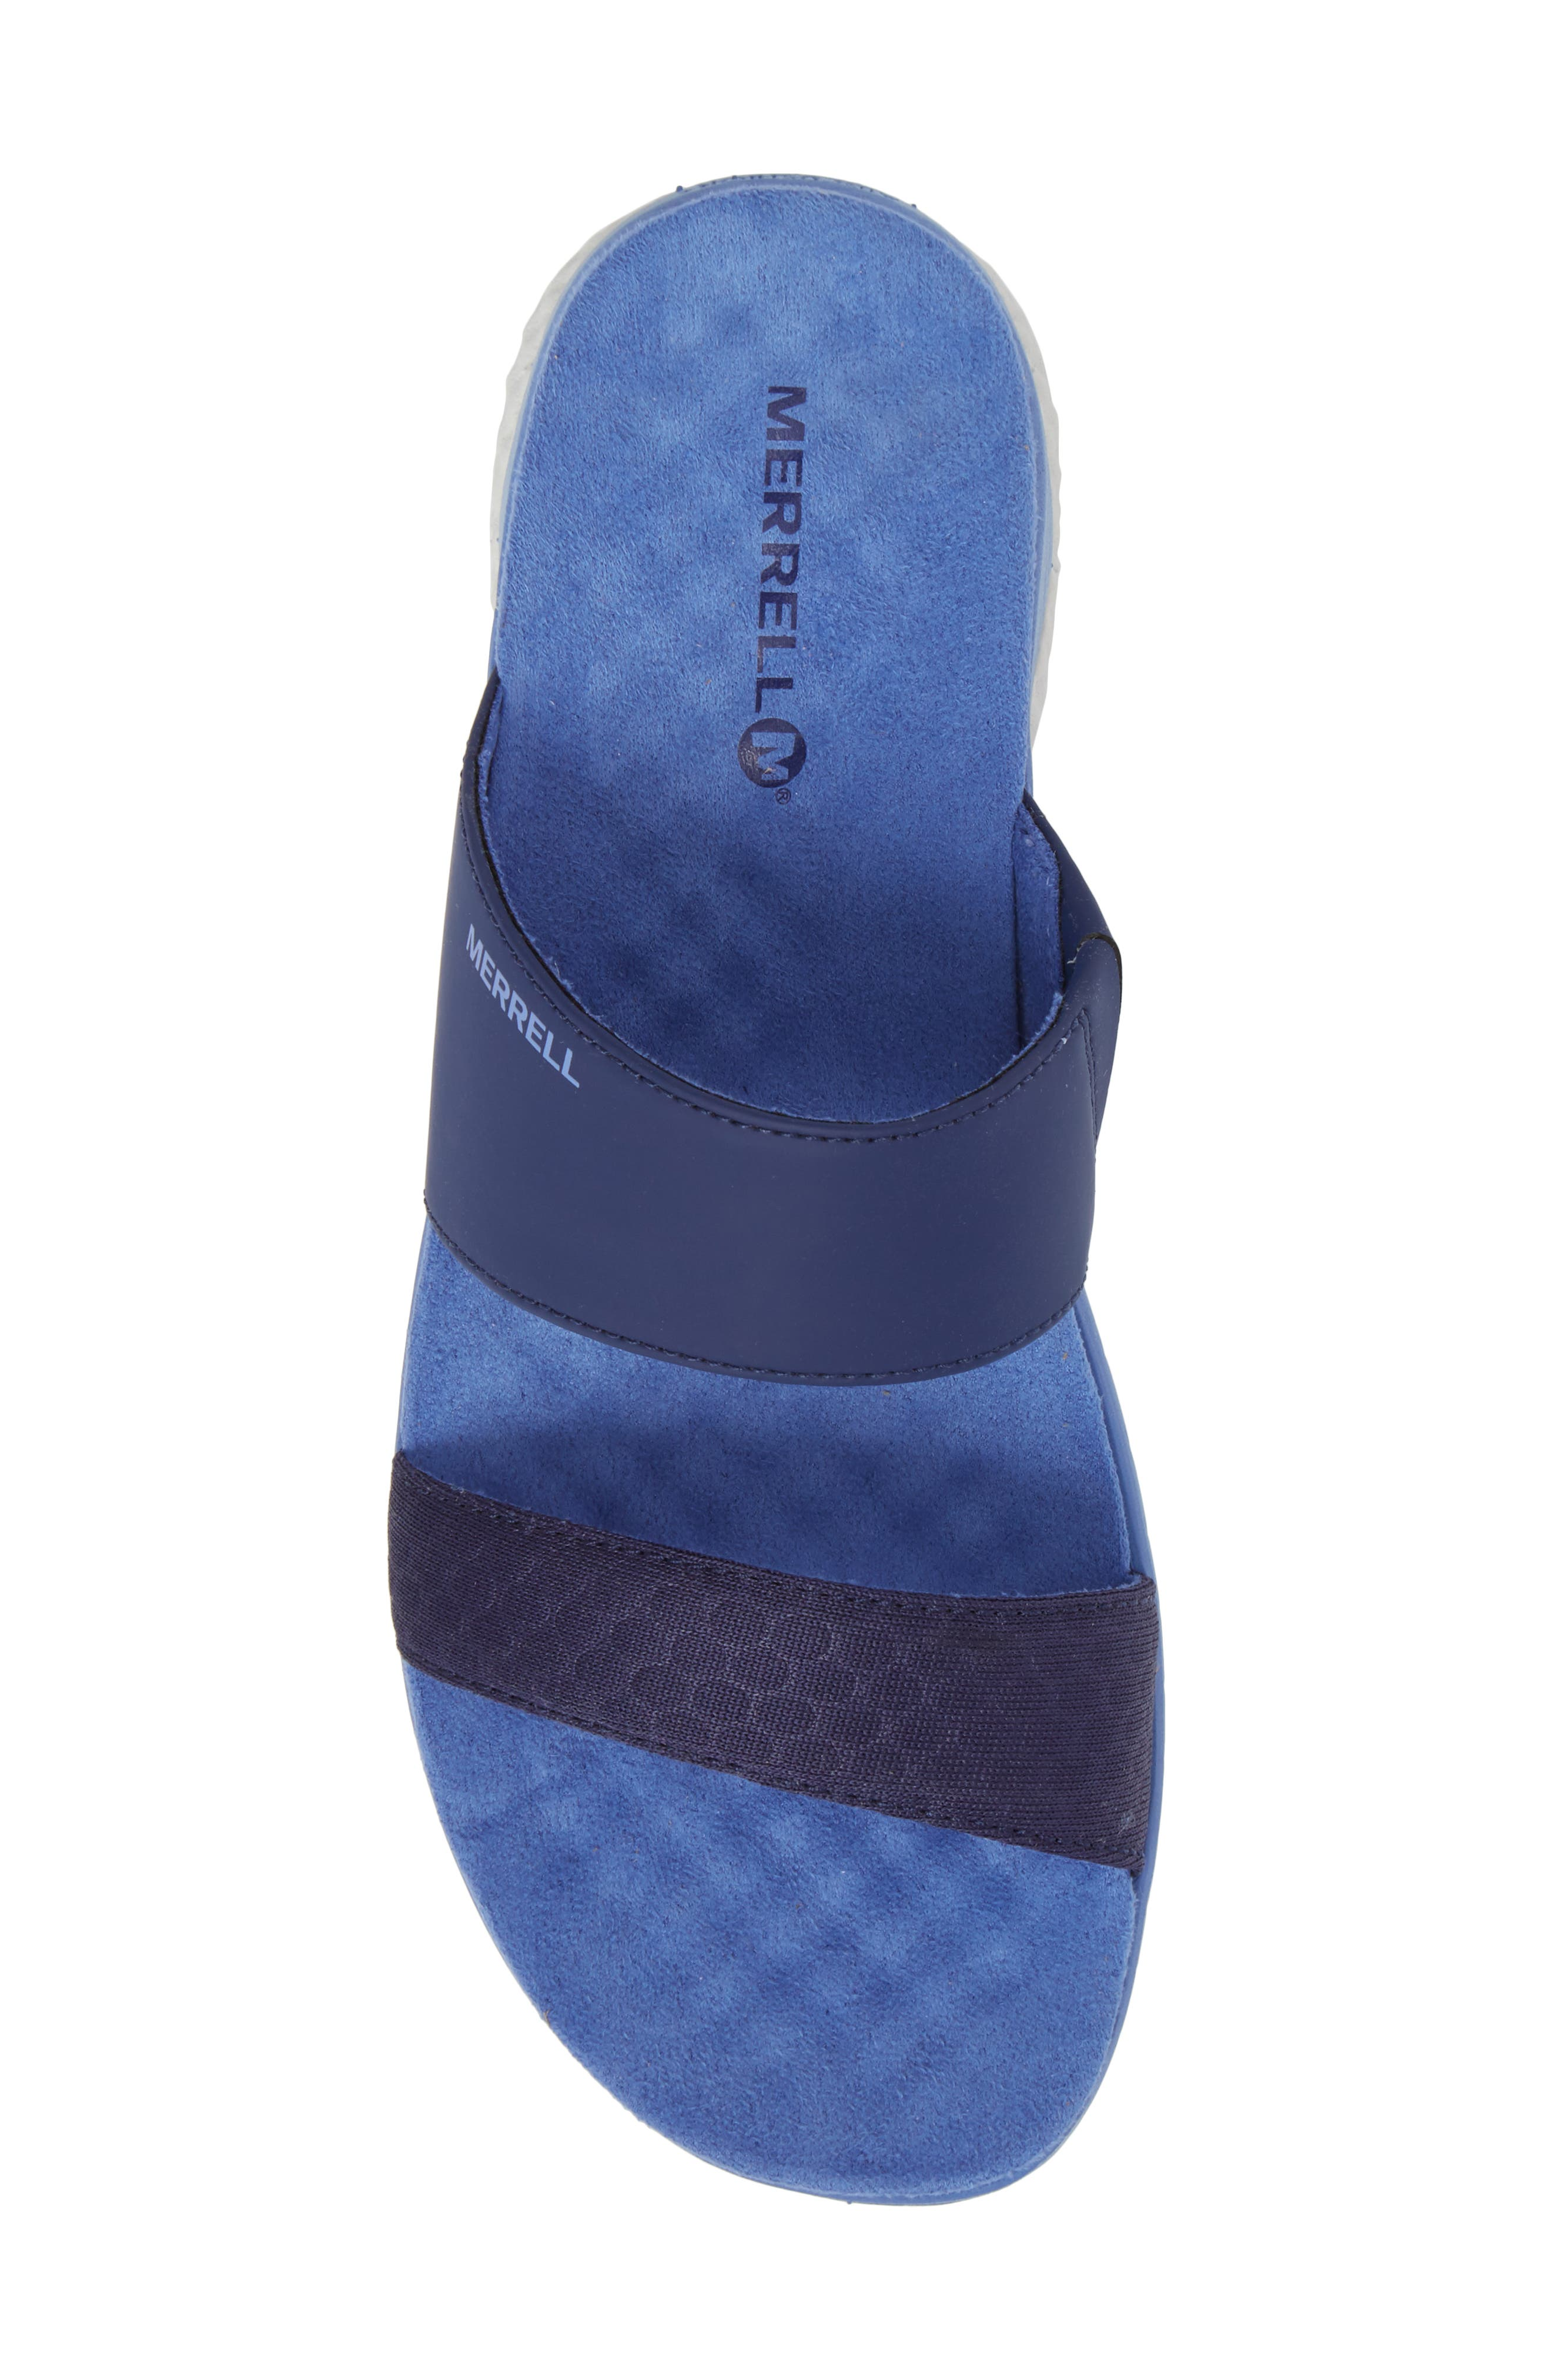 1SIX8 Linna Air Cushion+ Slide Sandal,                             Alternate thumbnail 19, color,